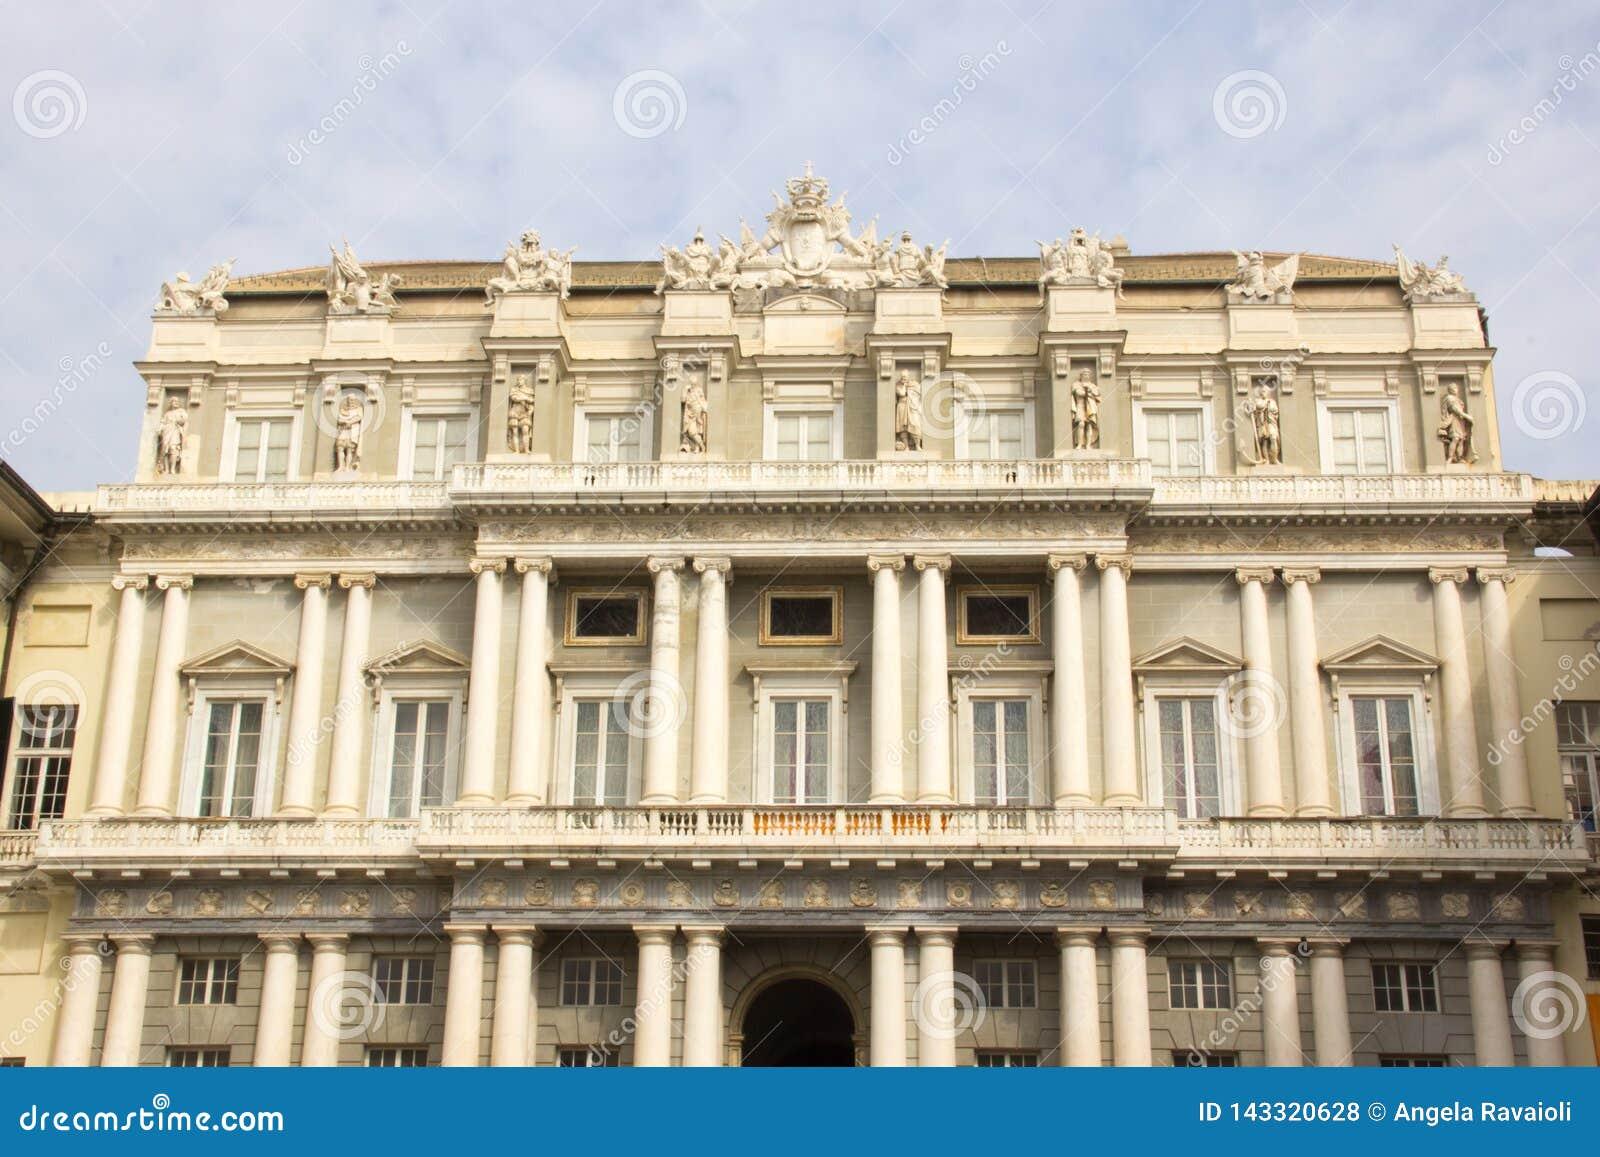 Façade Palazzo Дукале в Генуе